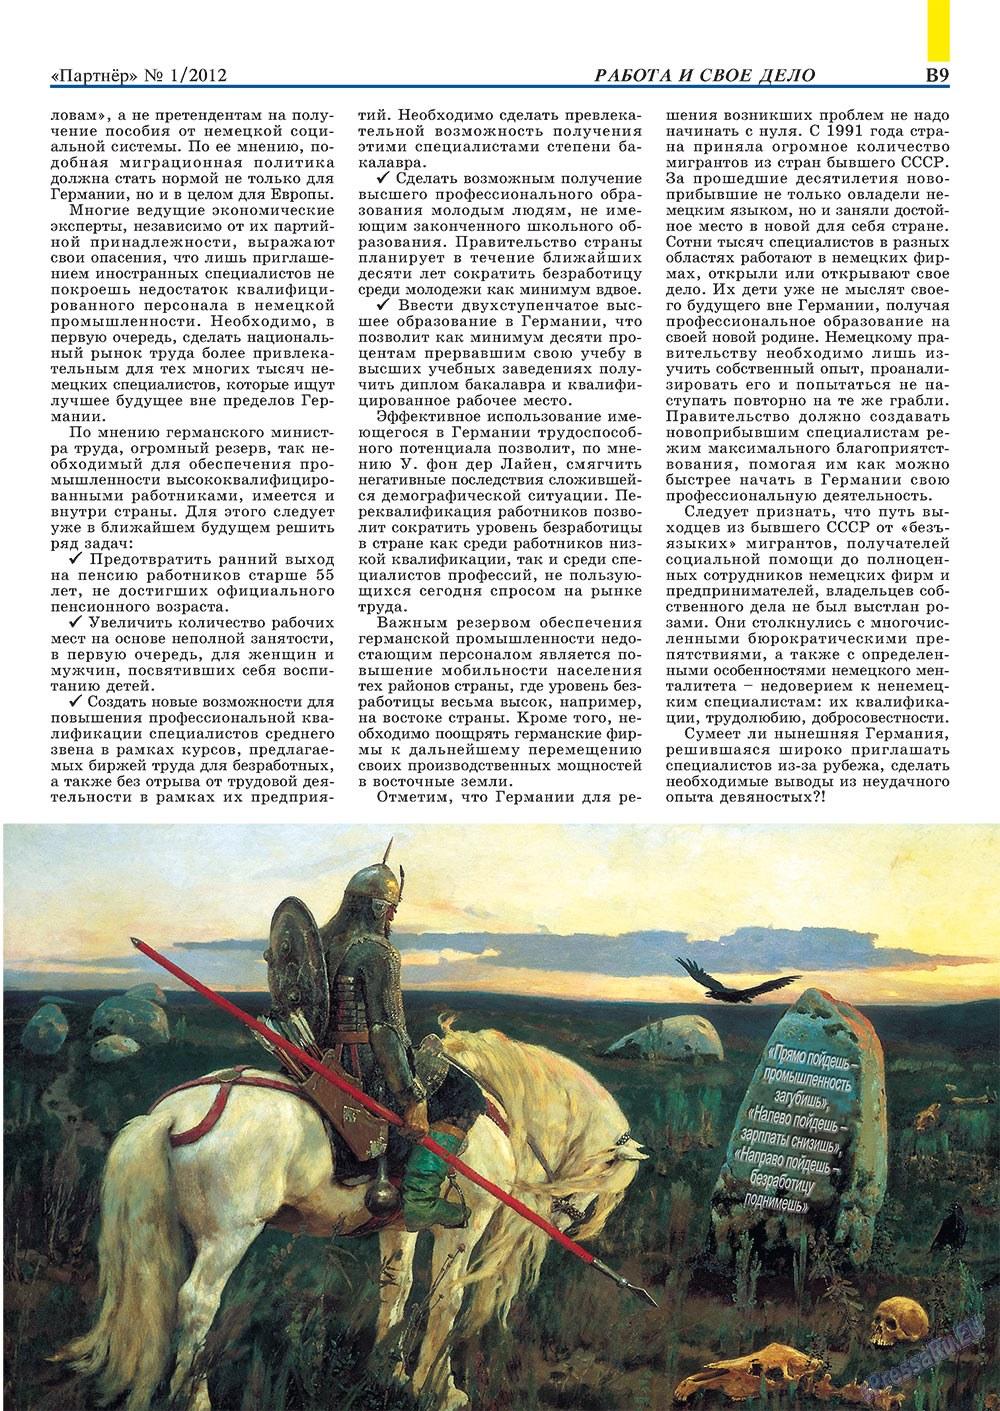 Партнер-север (журнал). 2012 год, номер 1, стр. 19